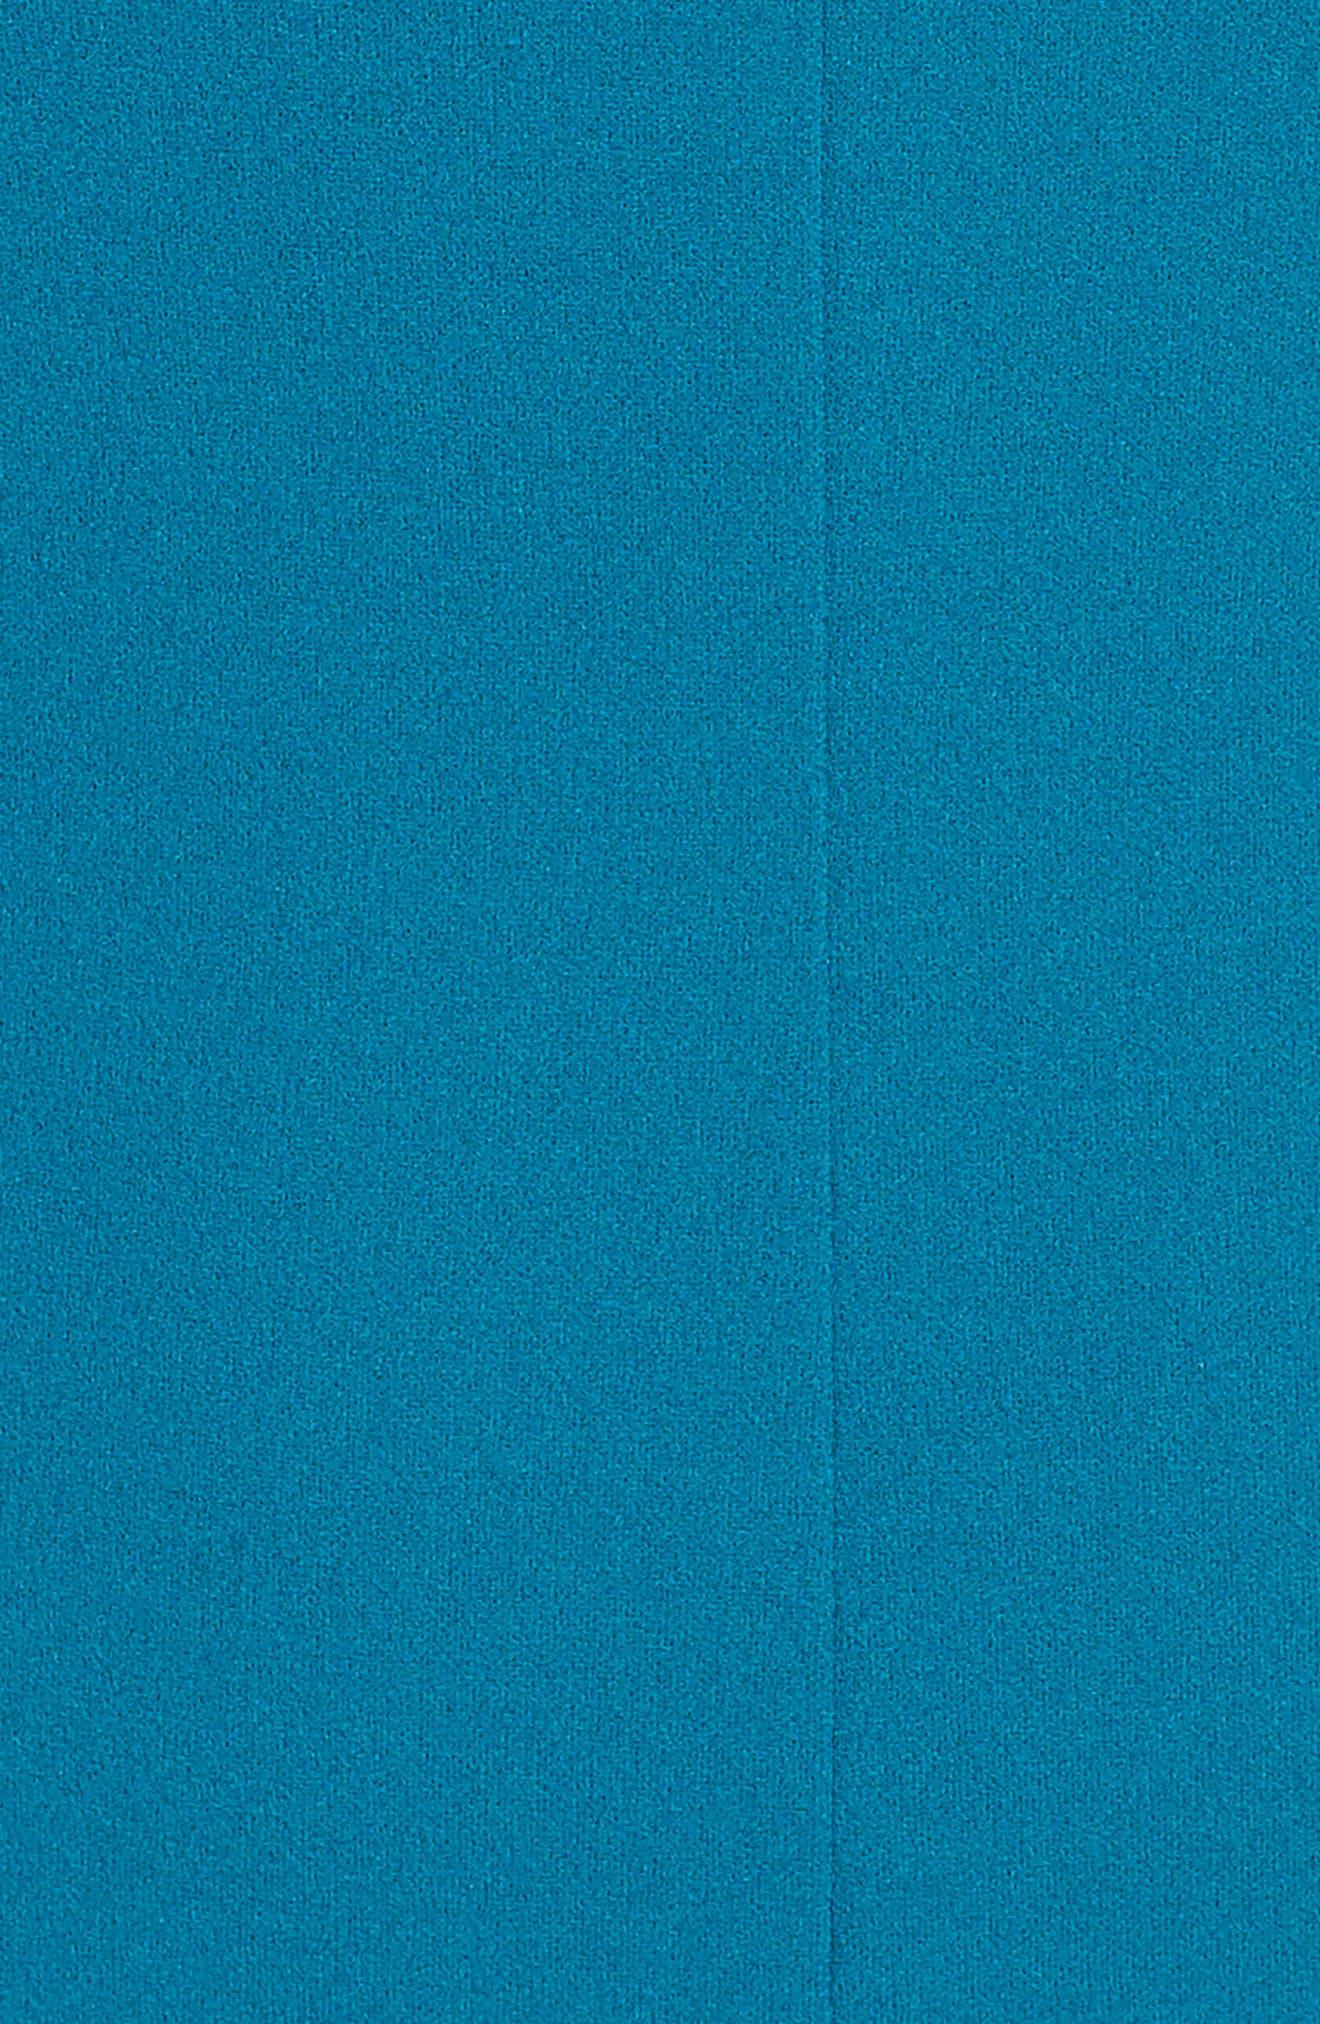 Bell Sleeve Sheath Dress,                             Alternate thumbnail 5, color,                             436